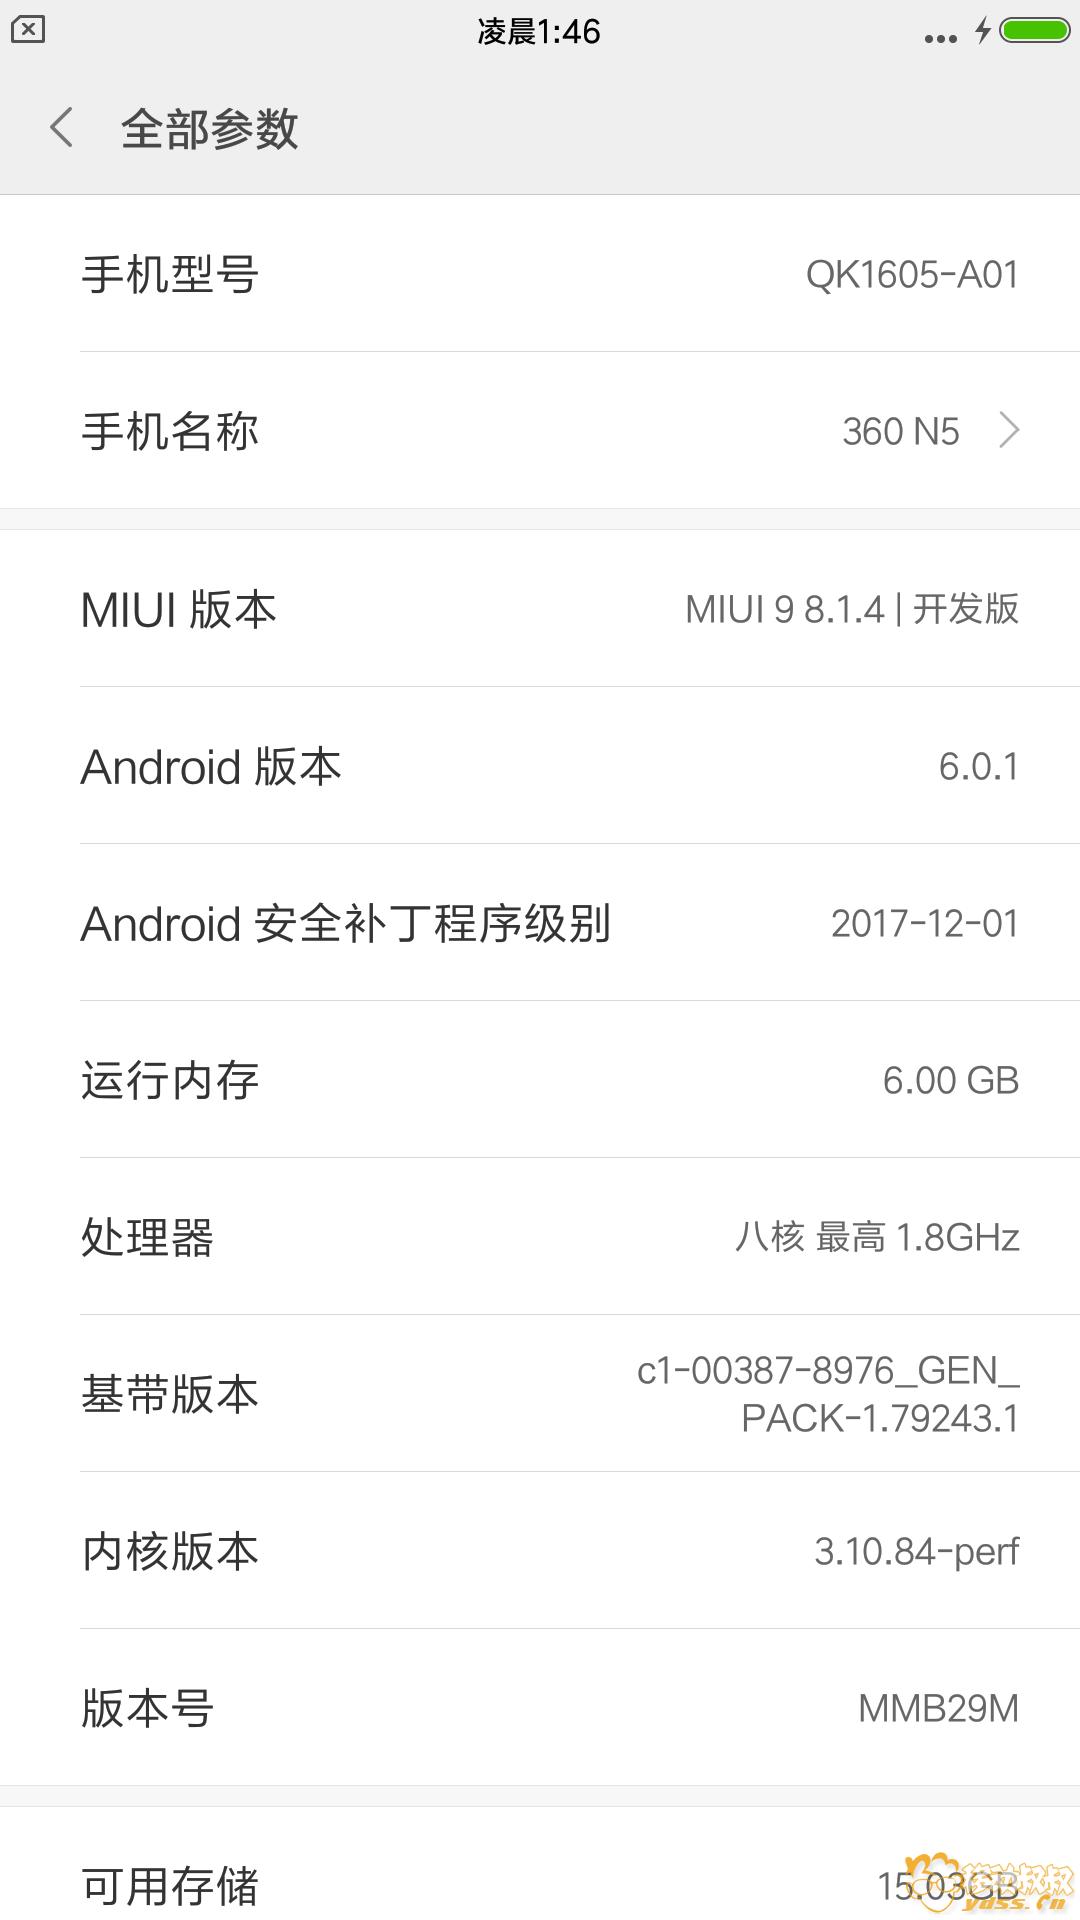 Screenshot_2016-01-01-01-46-11-462_com.android.settings.png